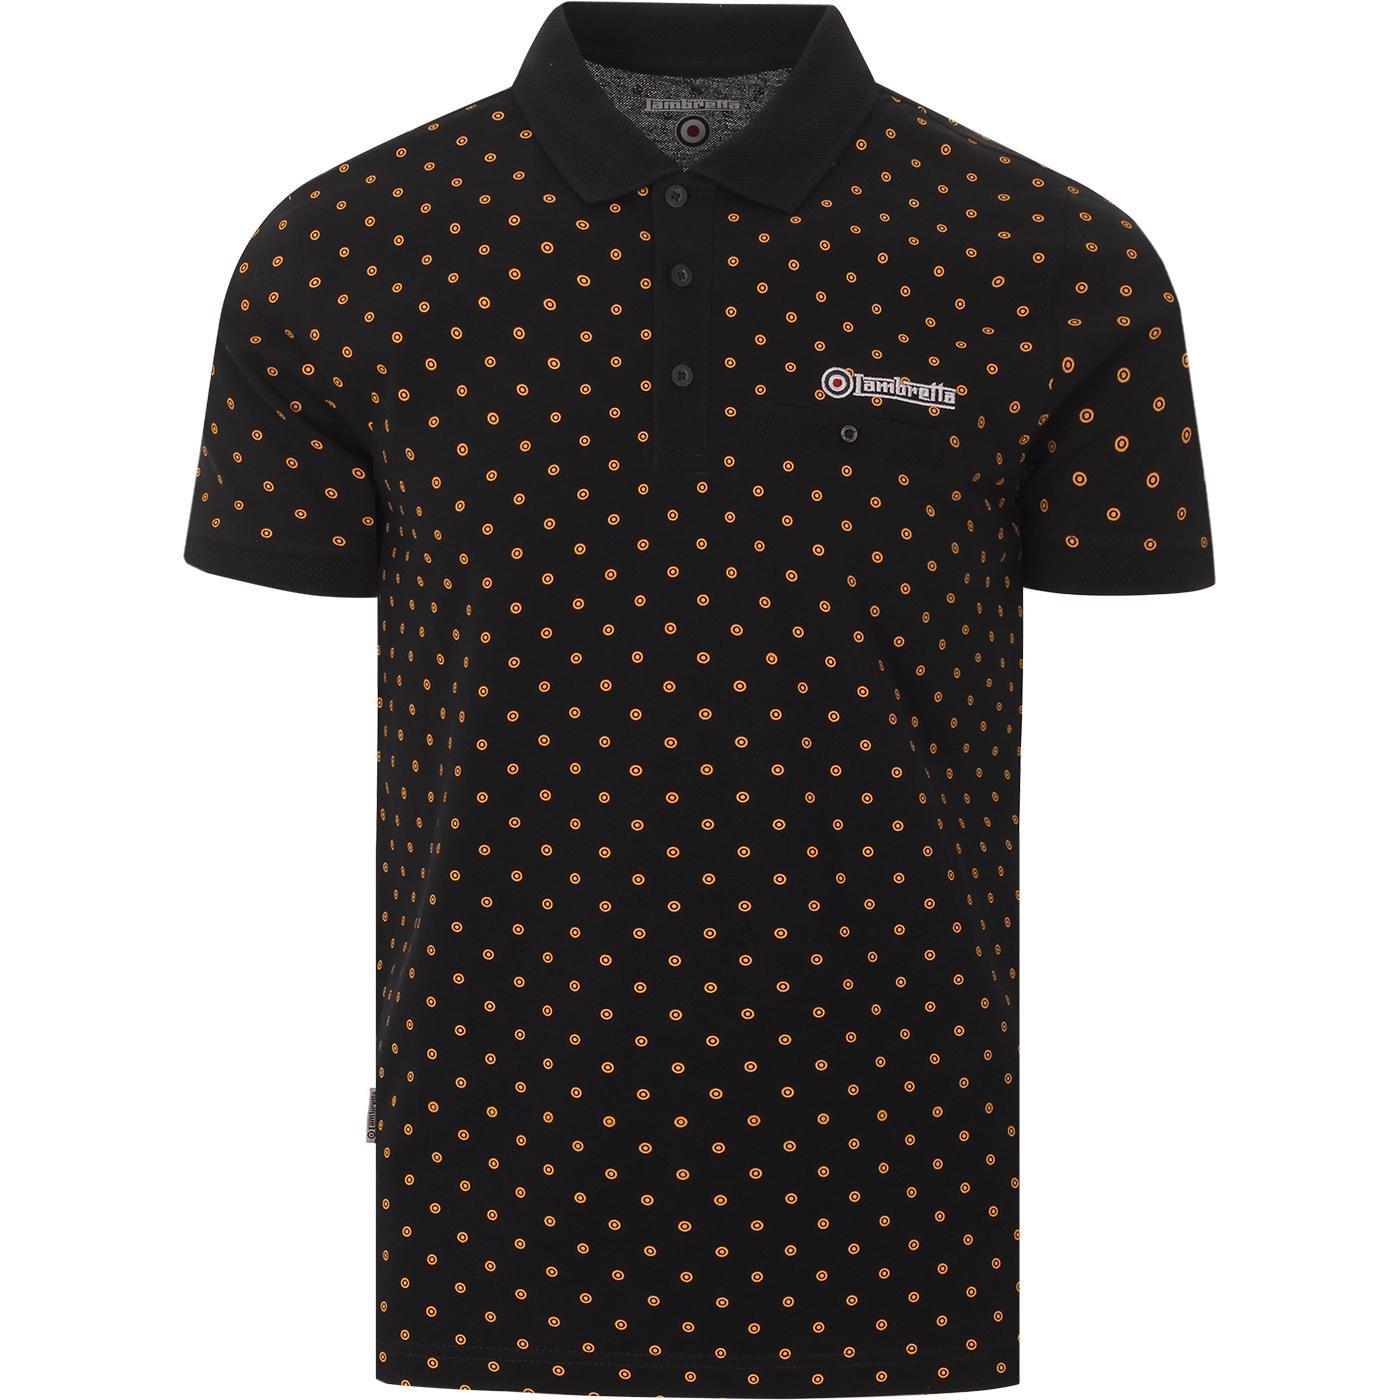 LAMBRETTA Men's Mini Mod Target Print Polo Top